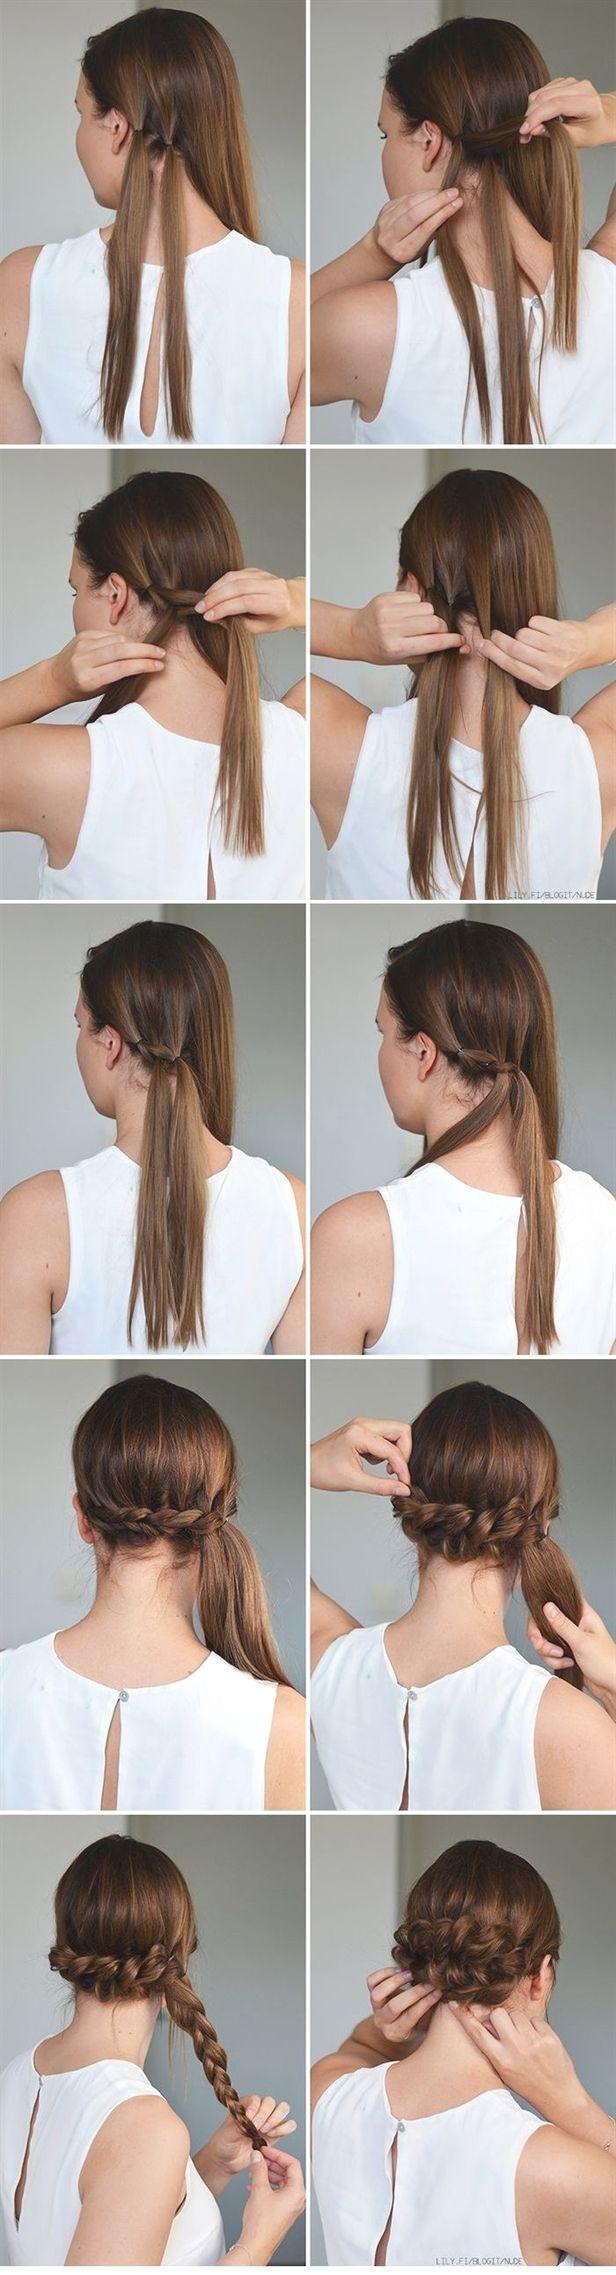 bellami hair extensions coupon, hair tatam zurag